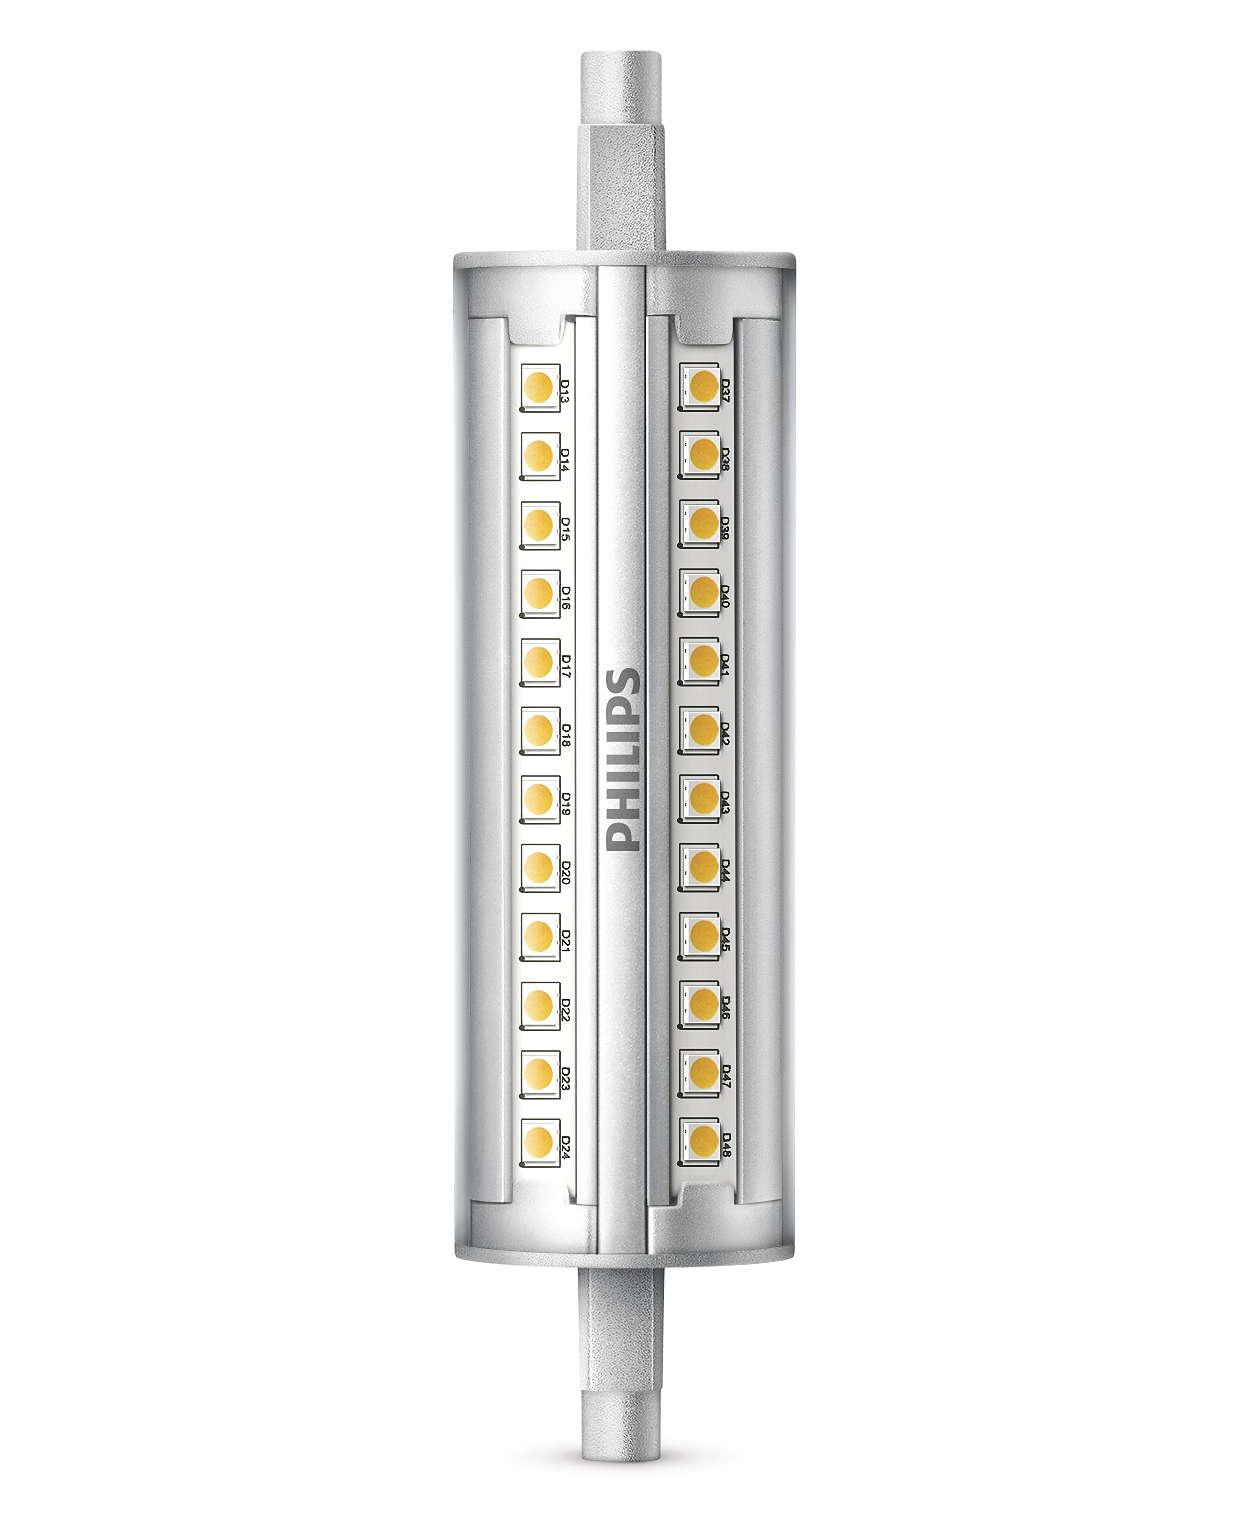 Luz LED lineal regulable con haz de 300grados